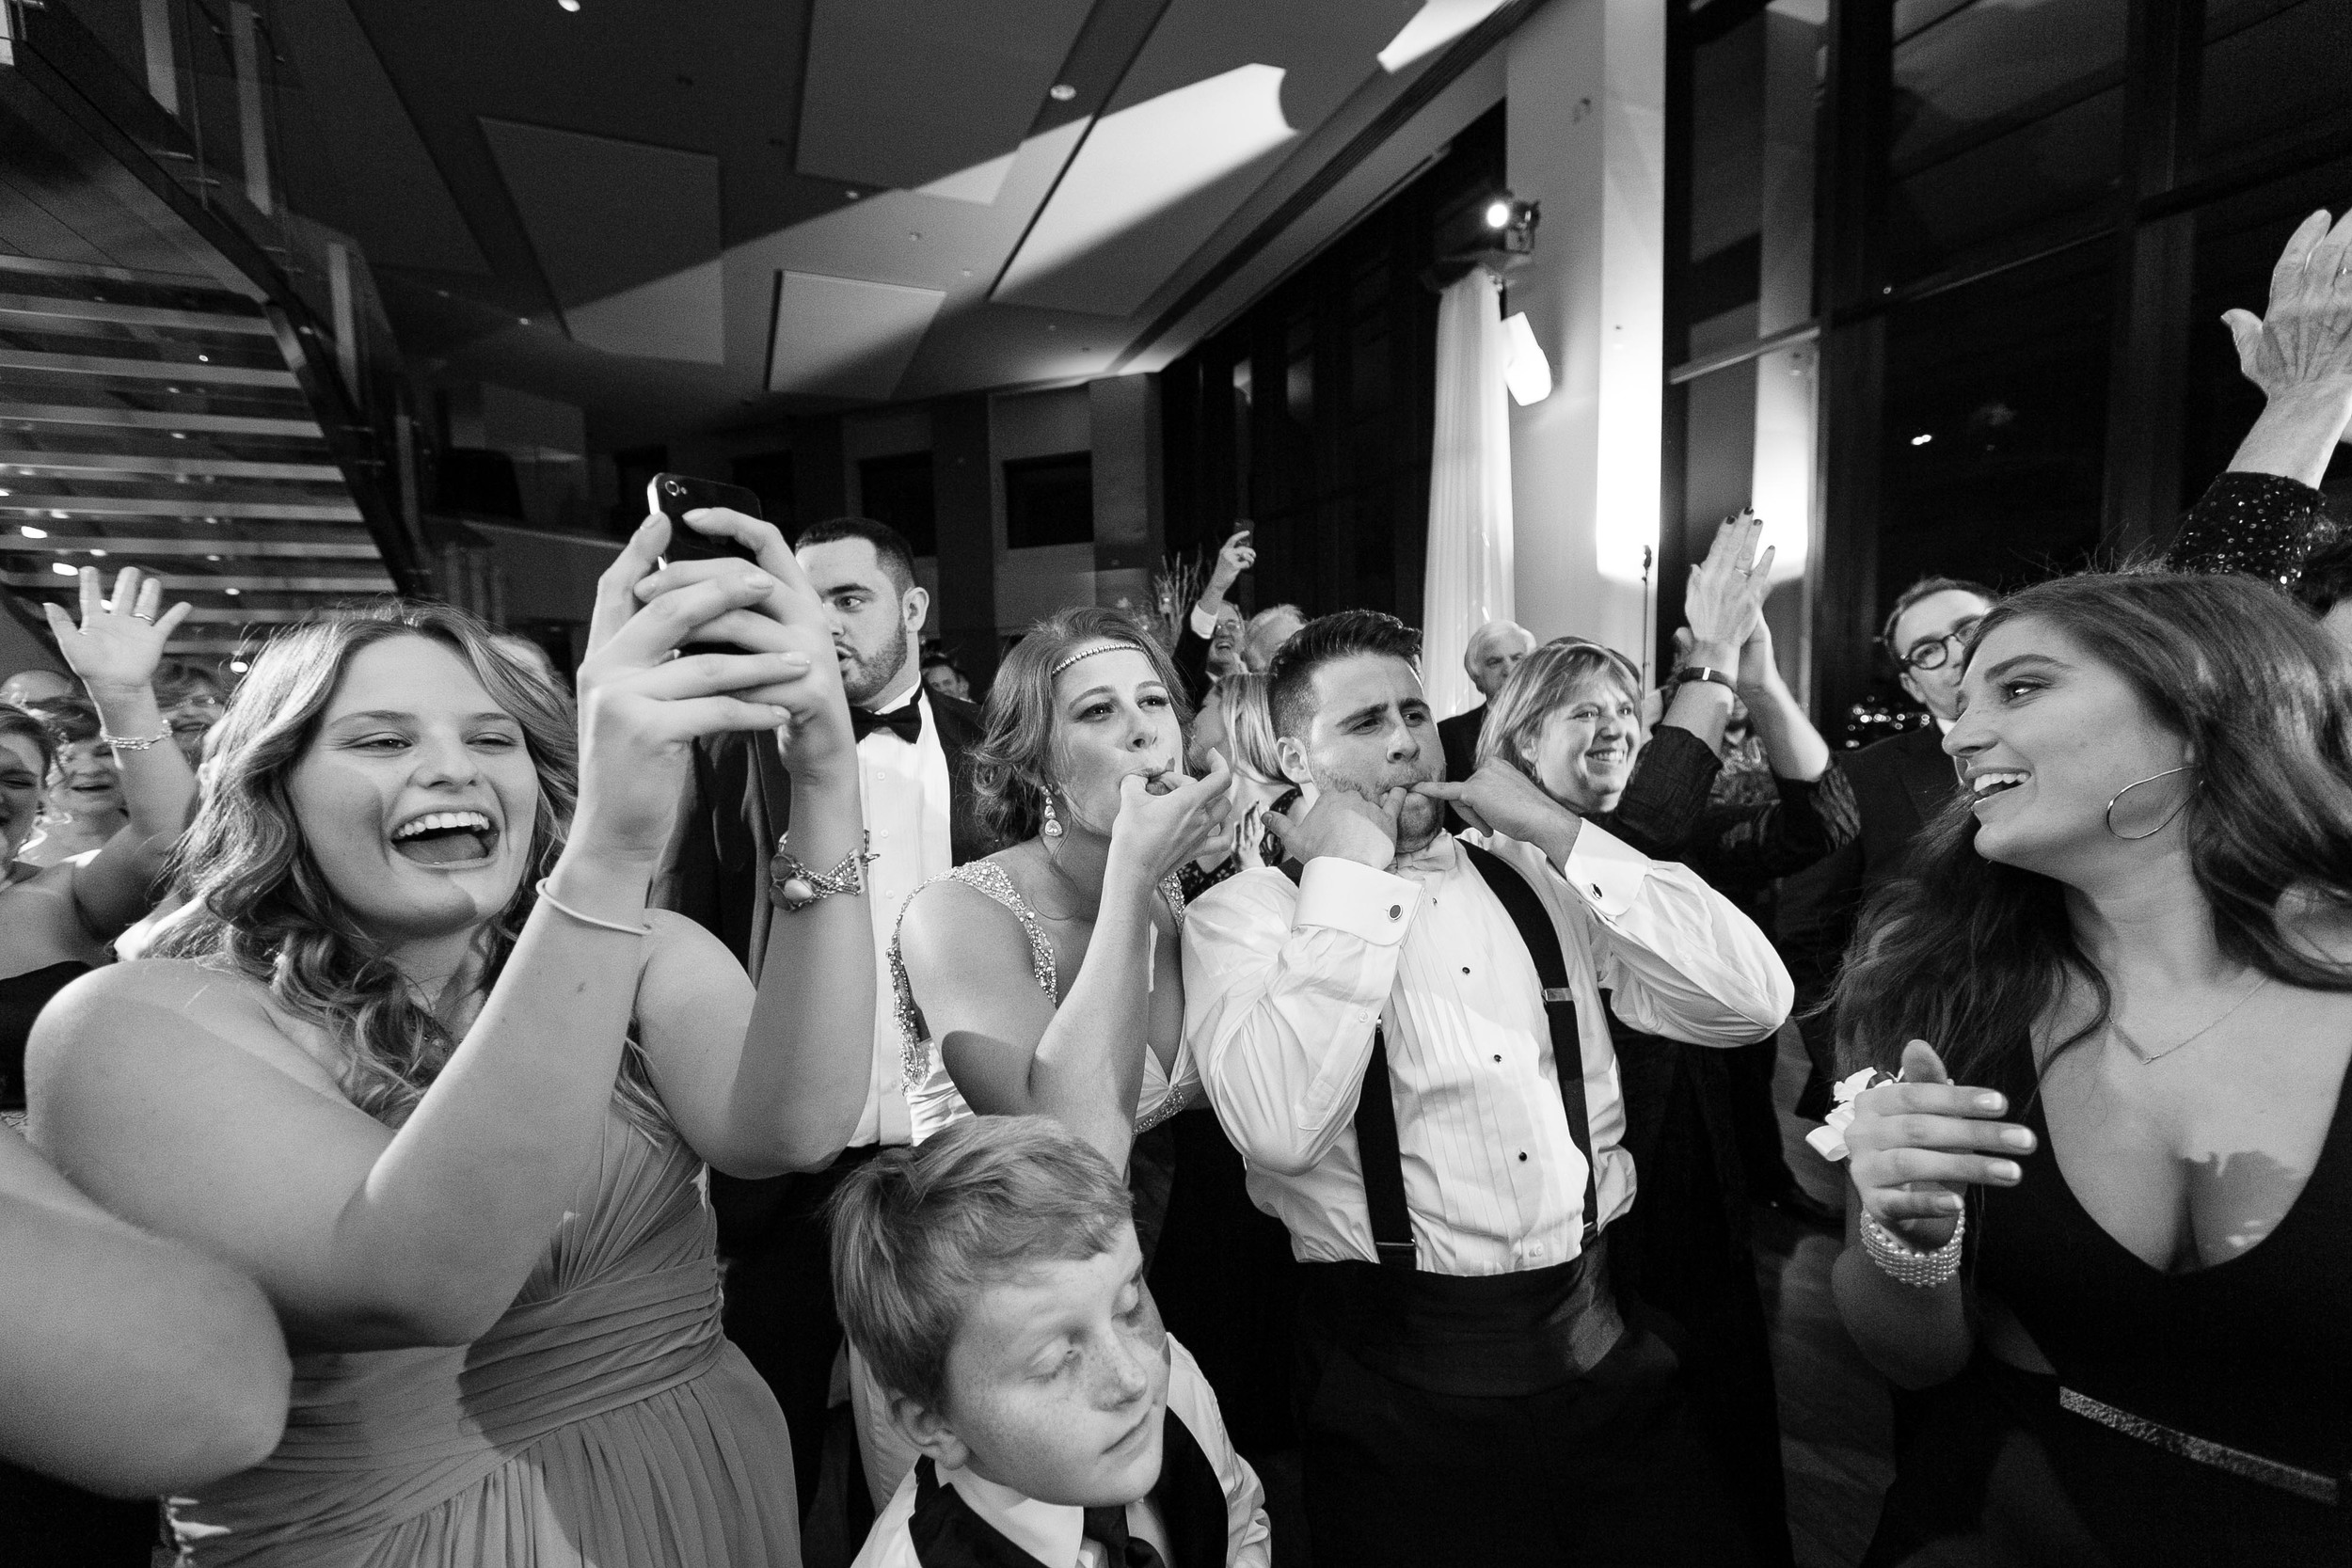 Luxurious-Jewish-Halloween-Wedding-State-Room-Boston-MA-Photojournalistic-Wedding-Photography-Jacek-Dolata-36.jpg